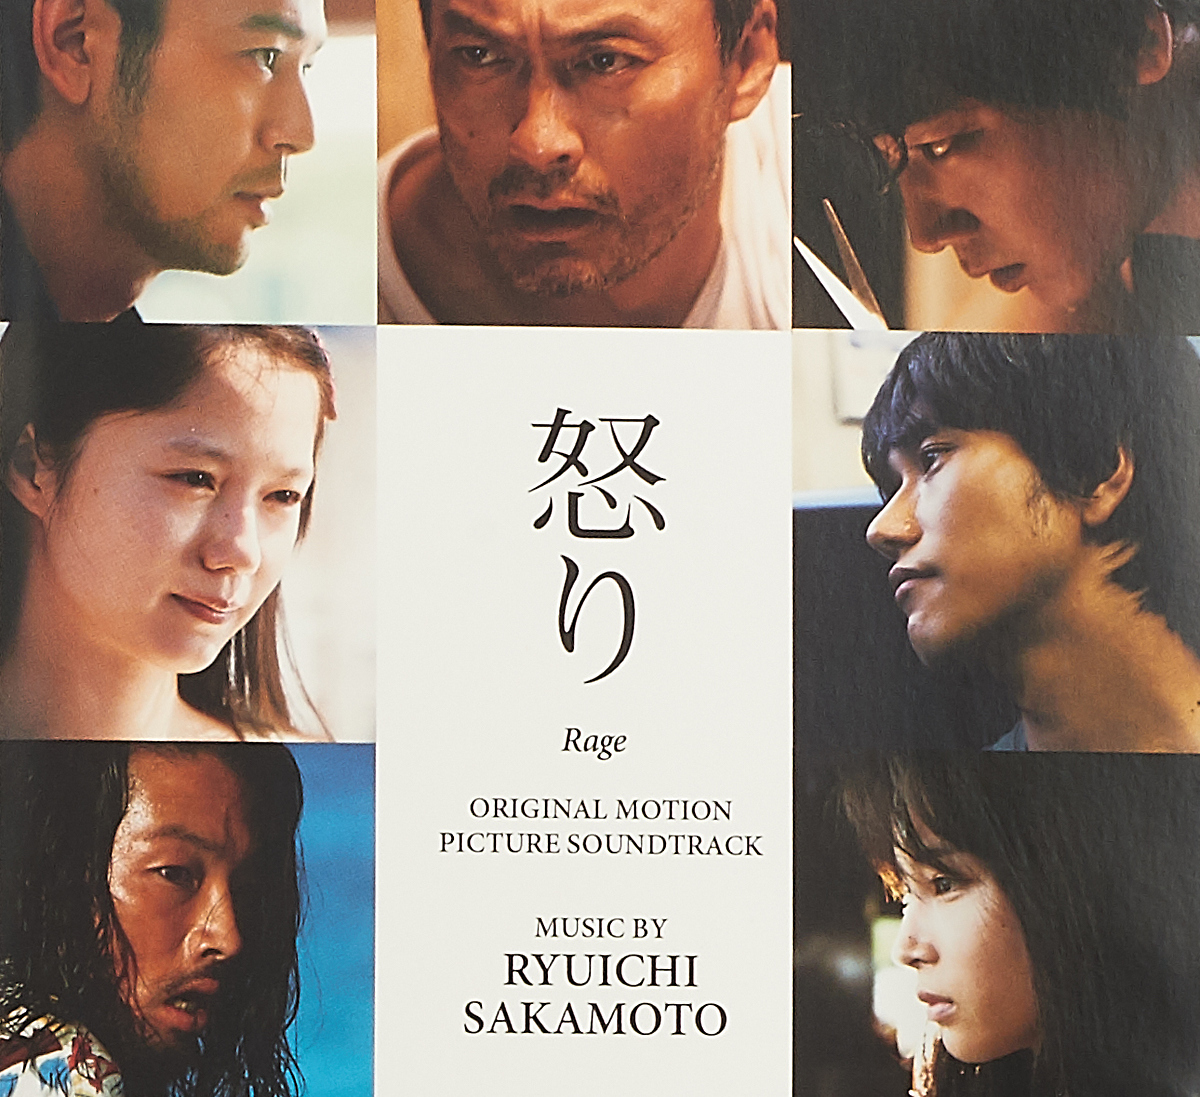 Rage. Original Motion Picture Soundtrack. Music By Ryuichi Sakamoto